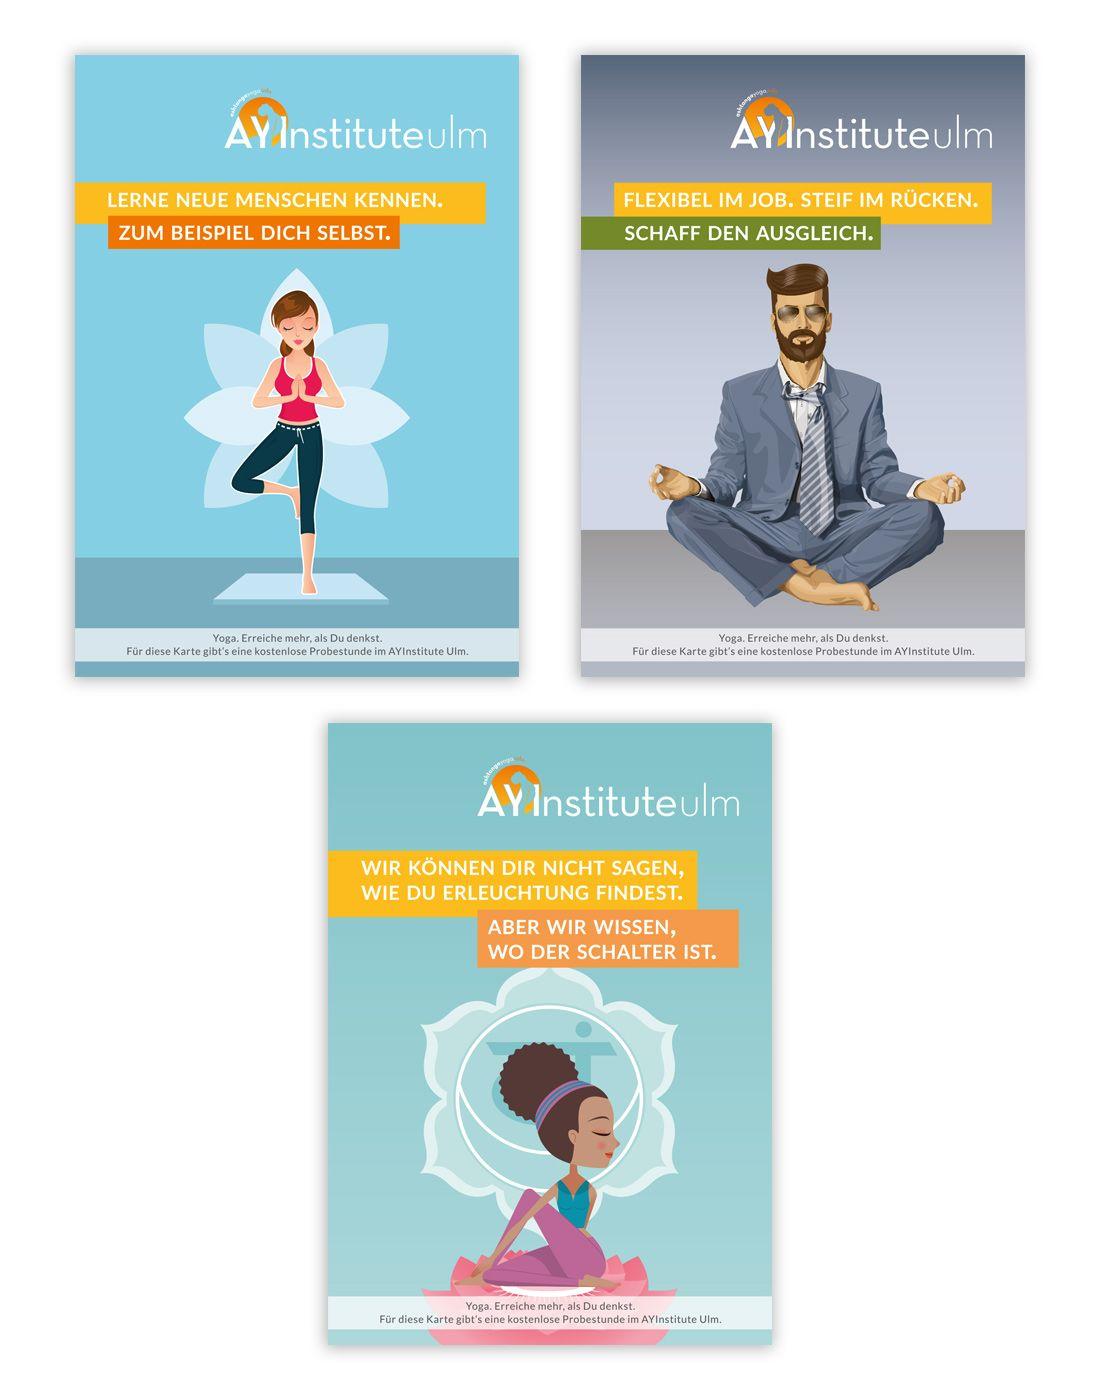 Ayinstitute Marketing Kampagne Konzeption Grafik Design Web Design